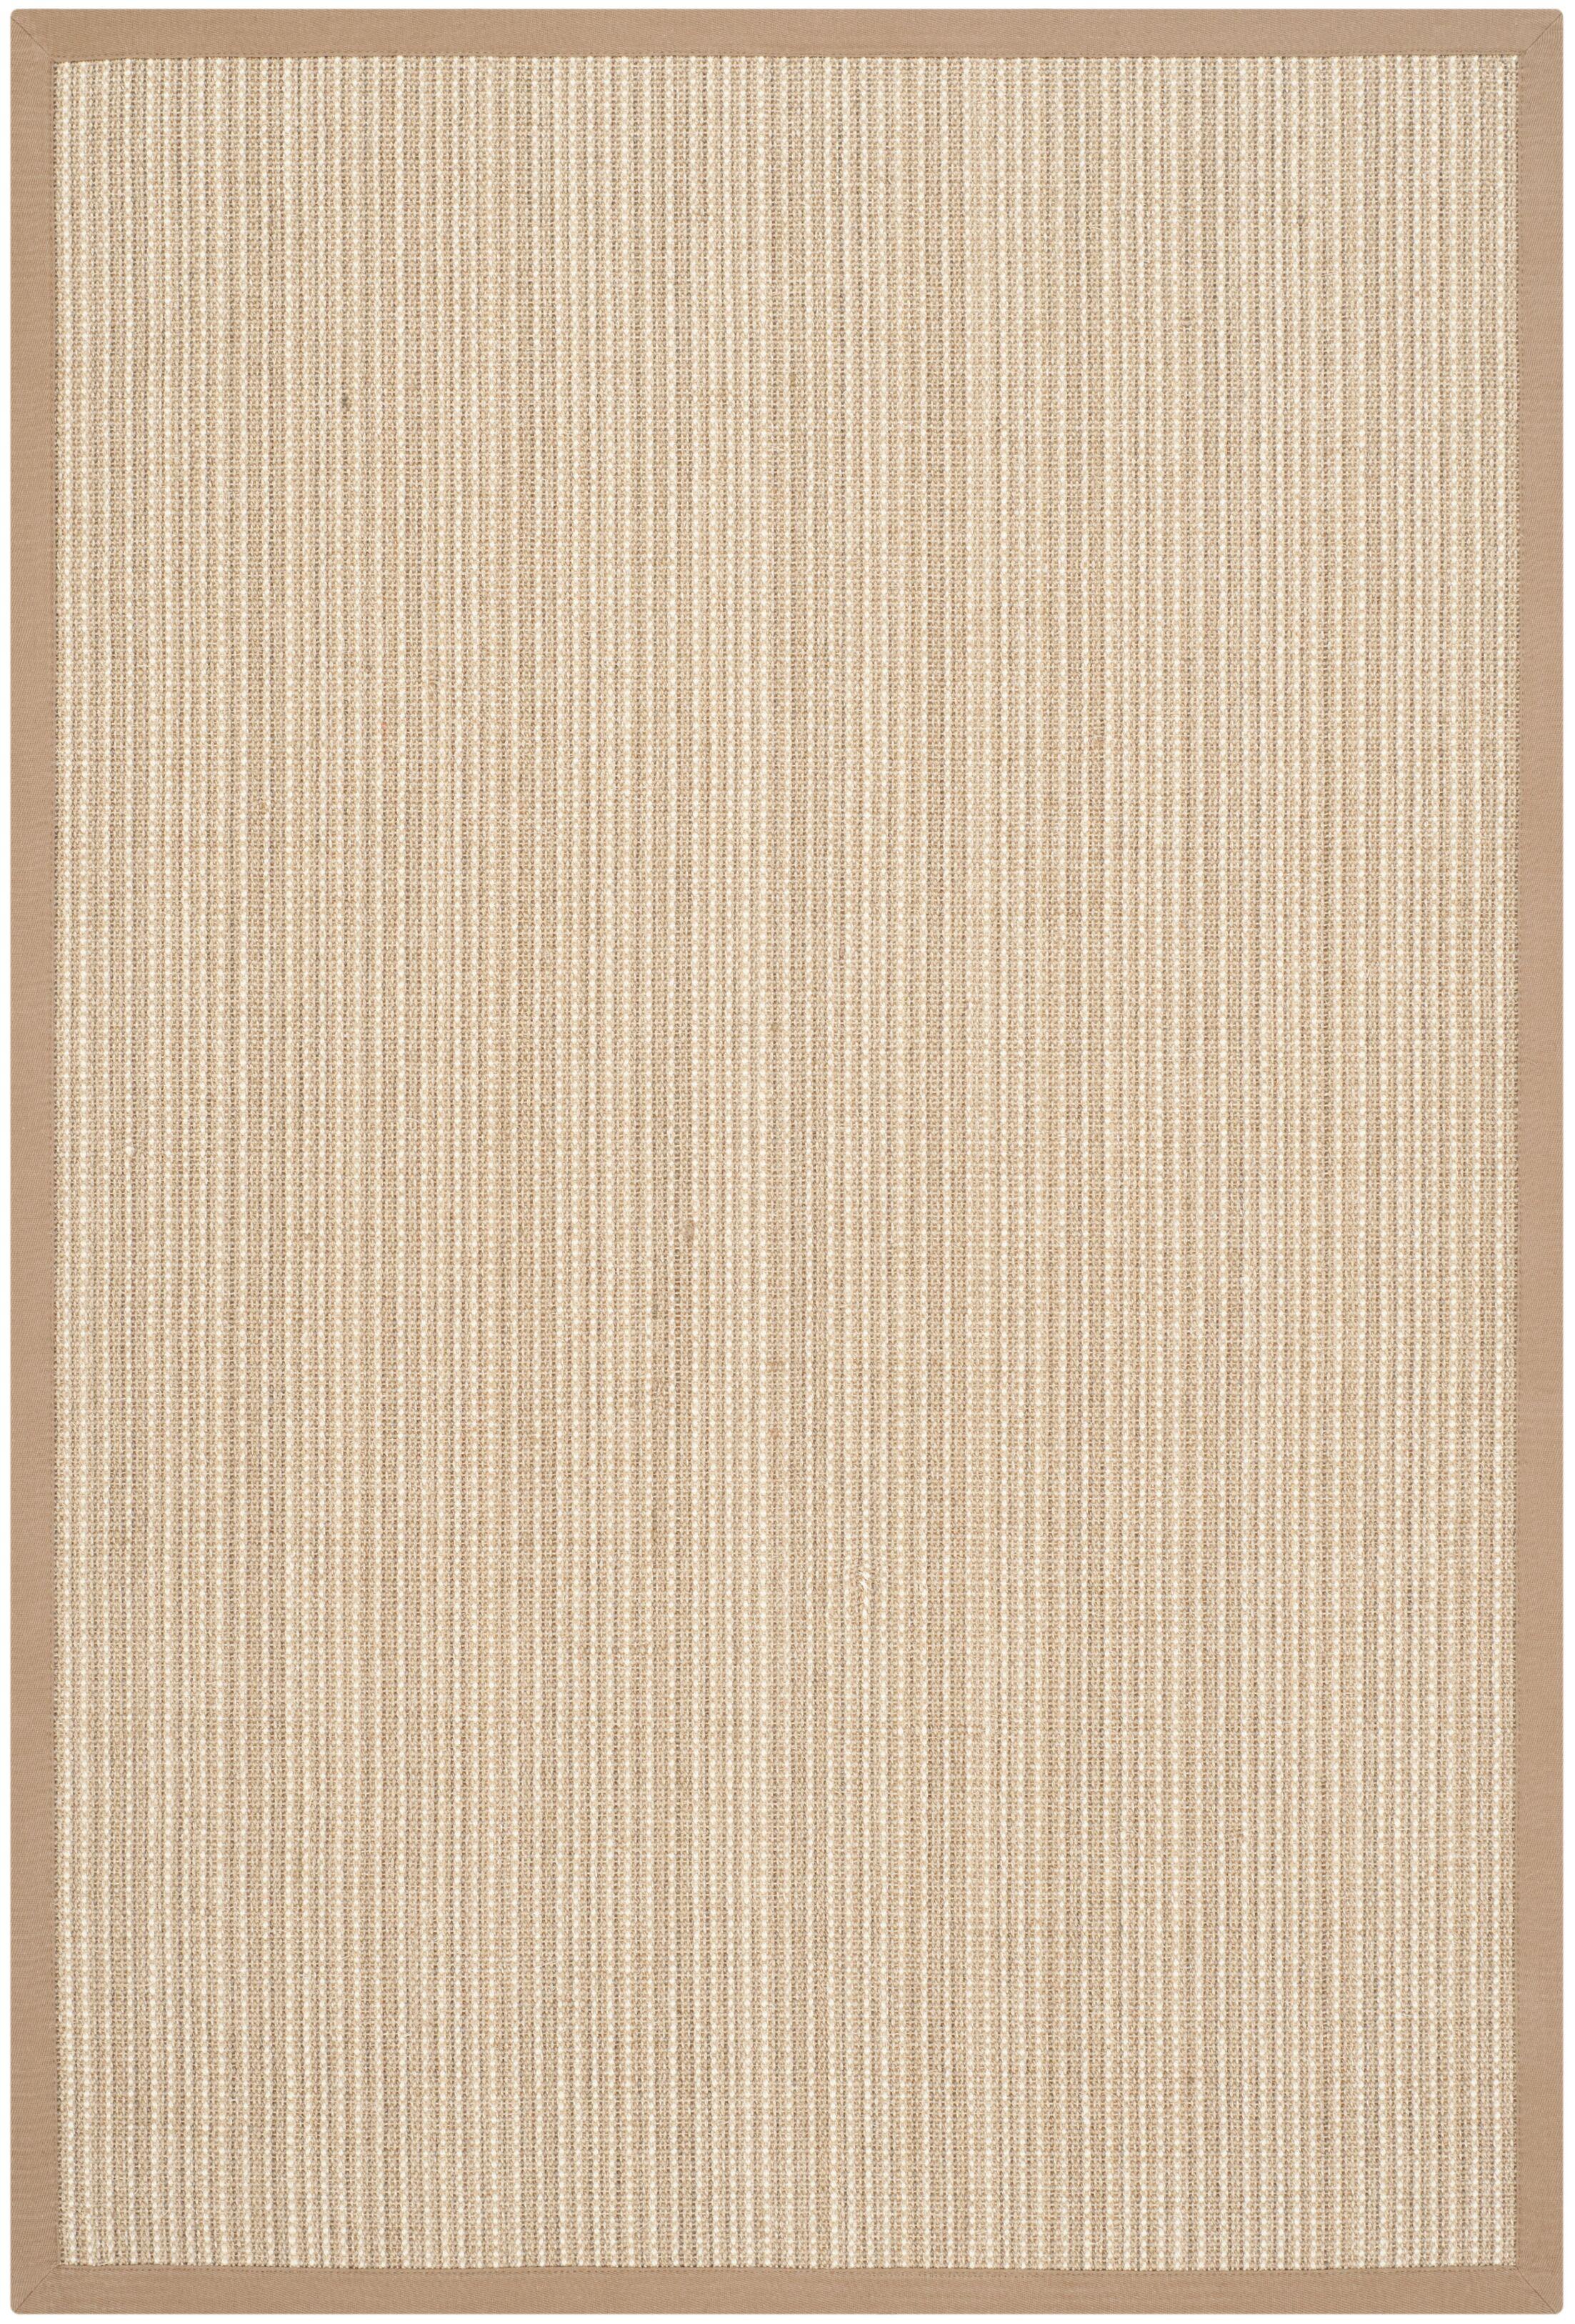 Palanga Tan Area Rug Rug Size: Rectangle 4' x 6'